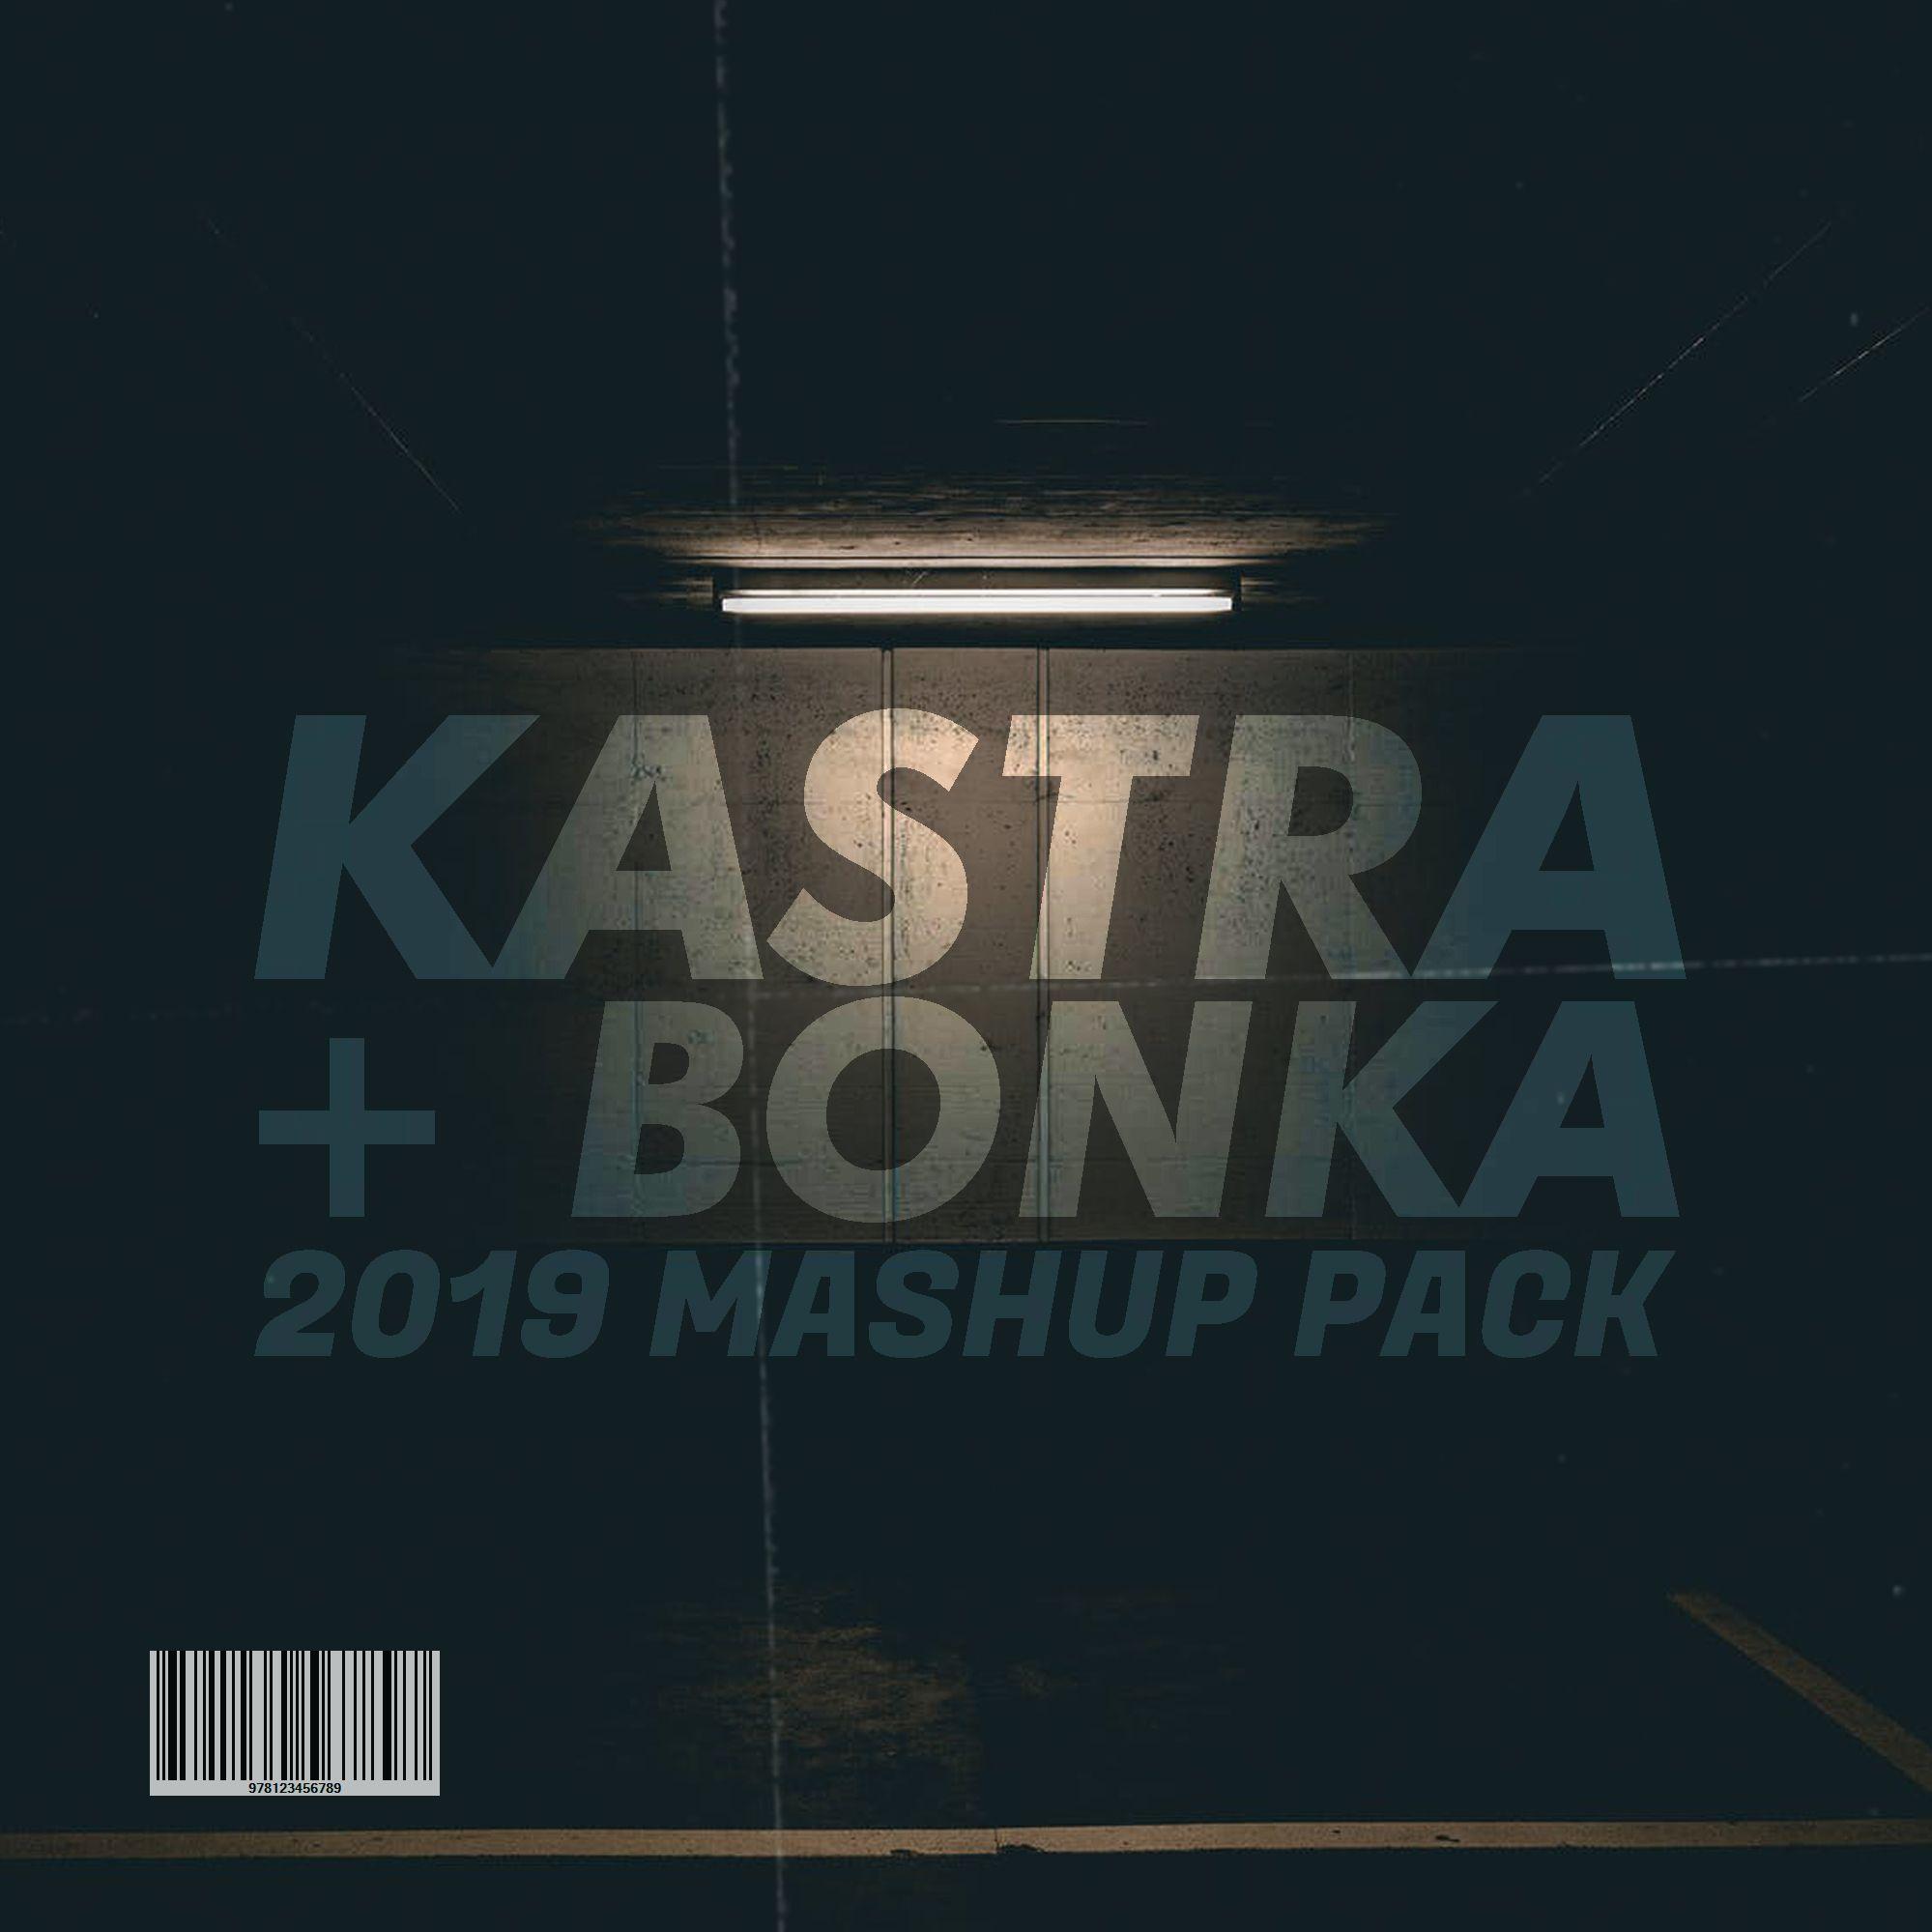 June 2019 Mashup Pack [25 MASHUPS] by Kastra x BONKA   Free